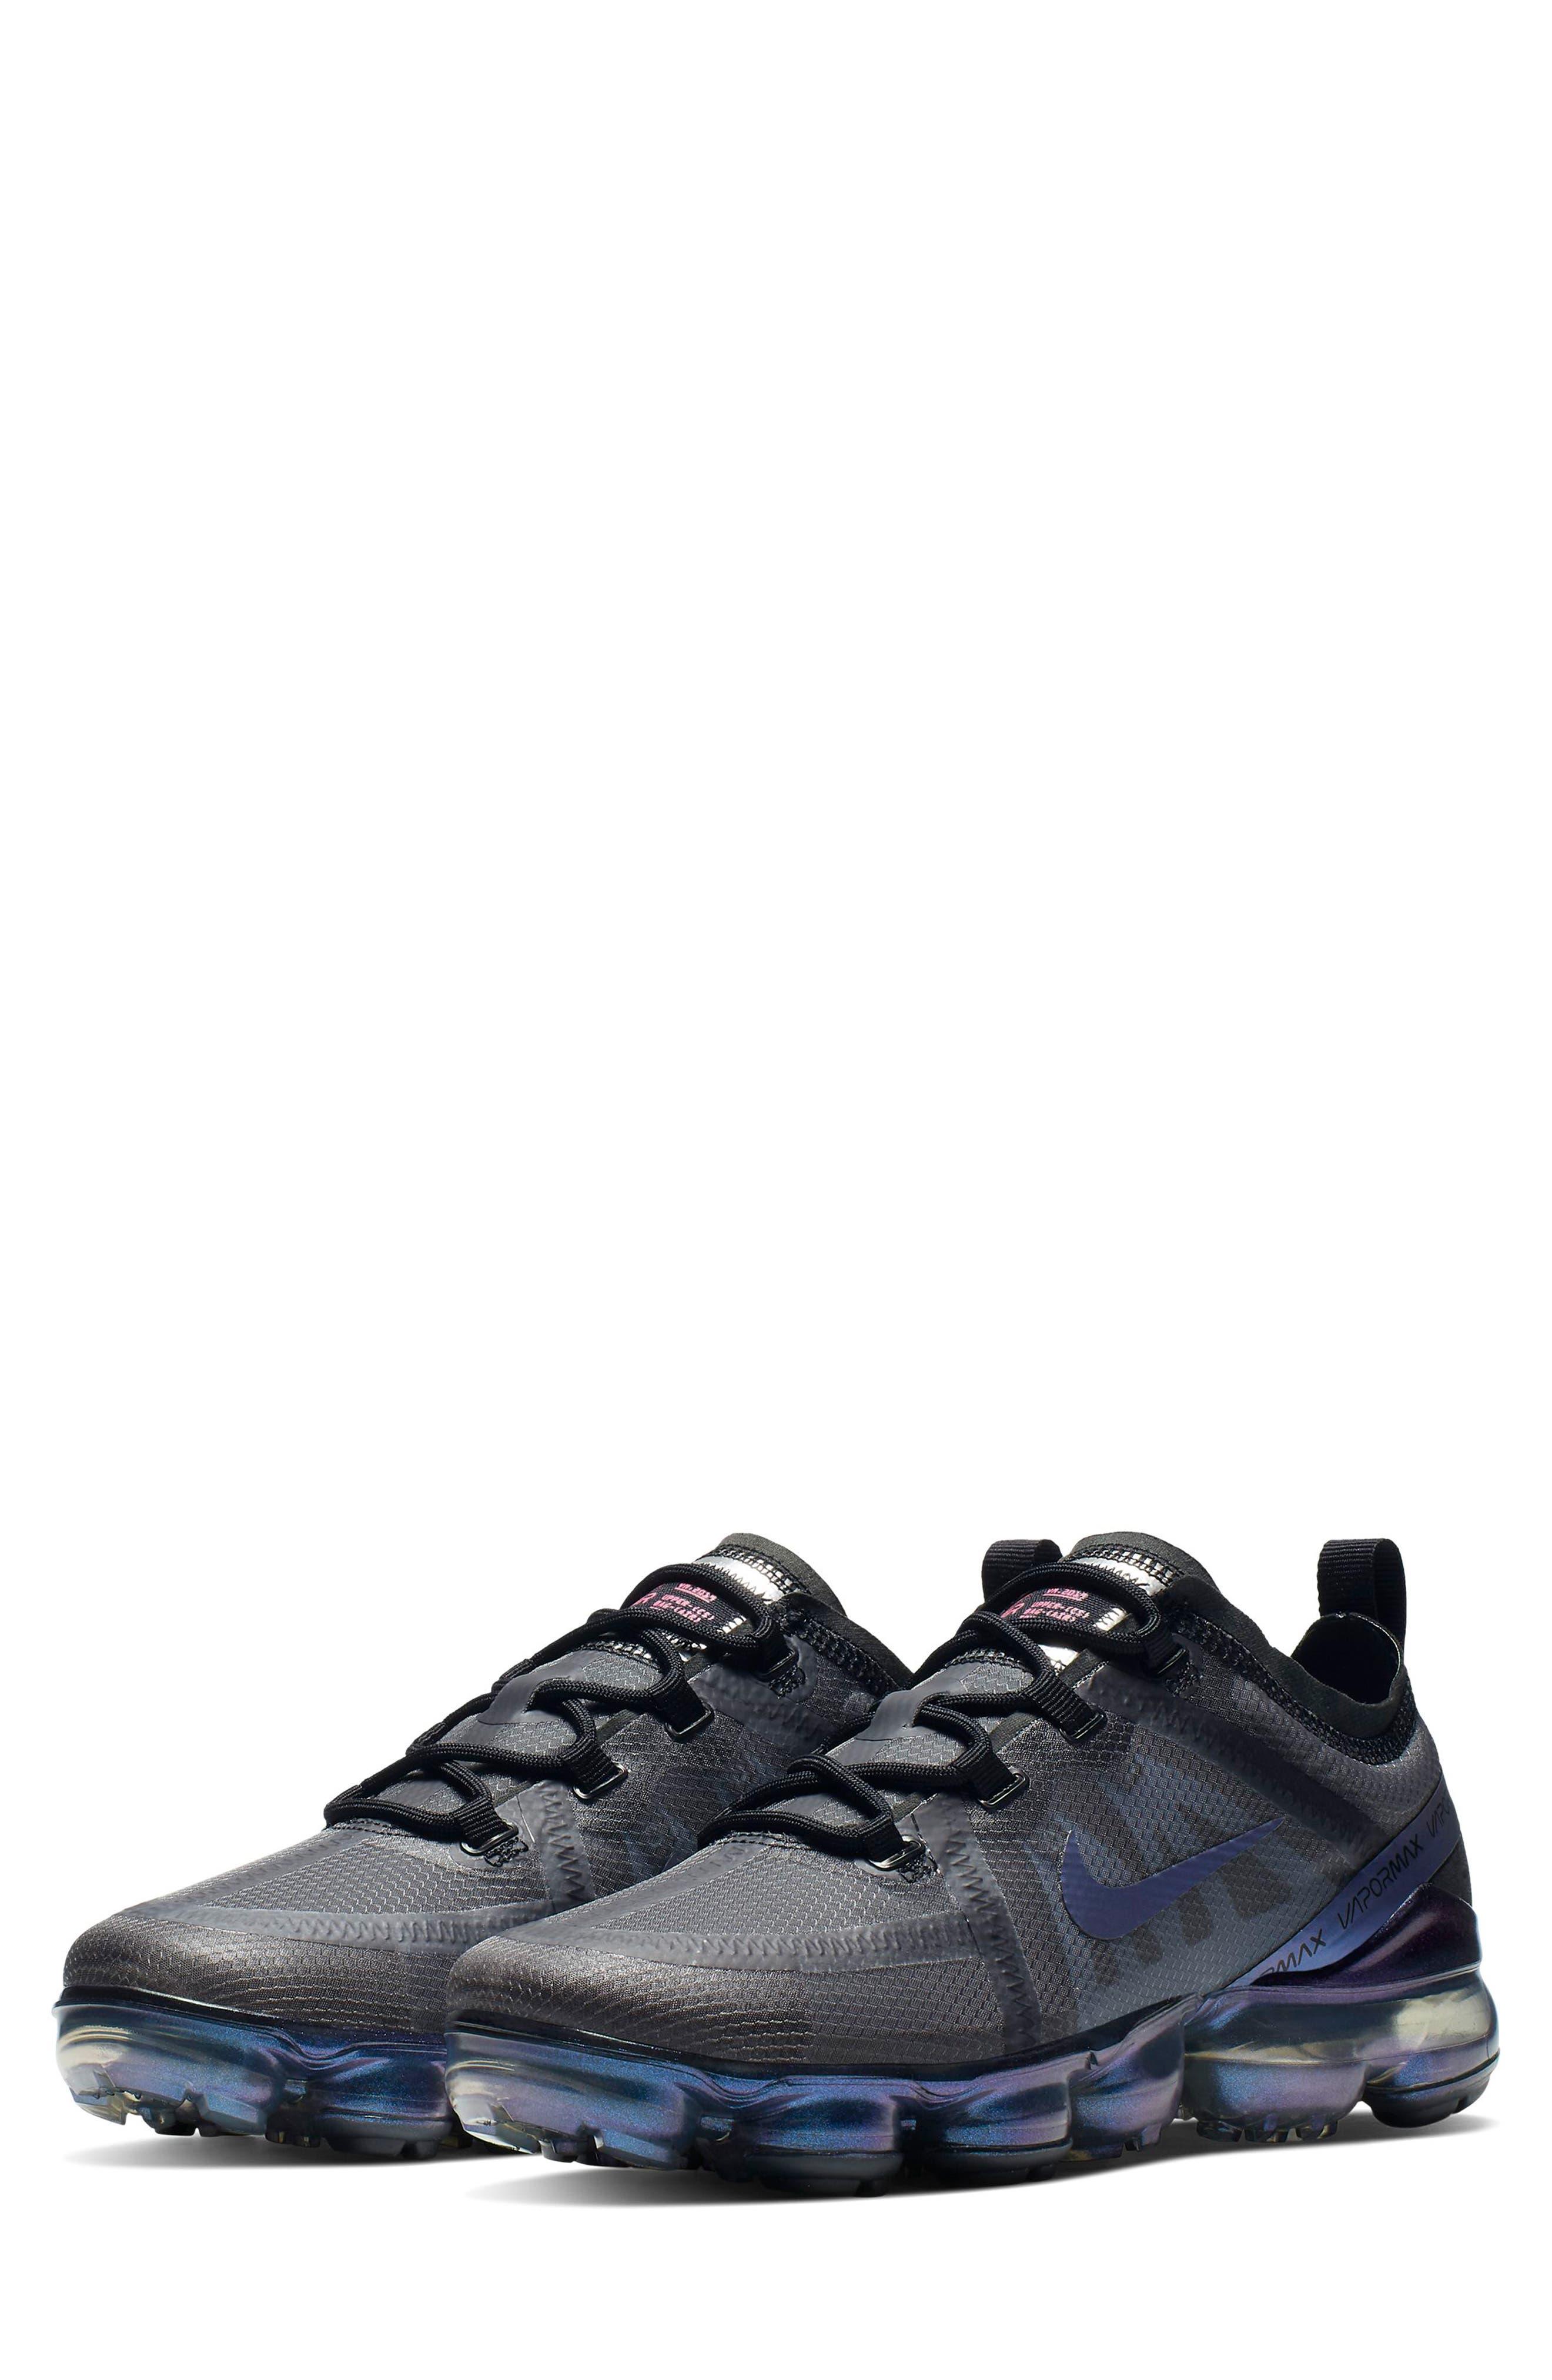 99ba49b969a Nike Vapor Max Air Backpack Academy Seattle State Nike Vapor Energy ...